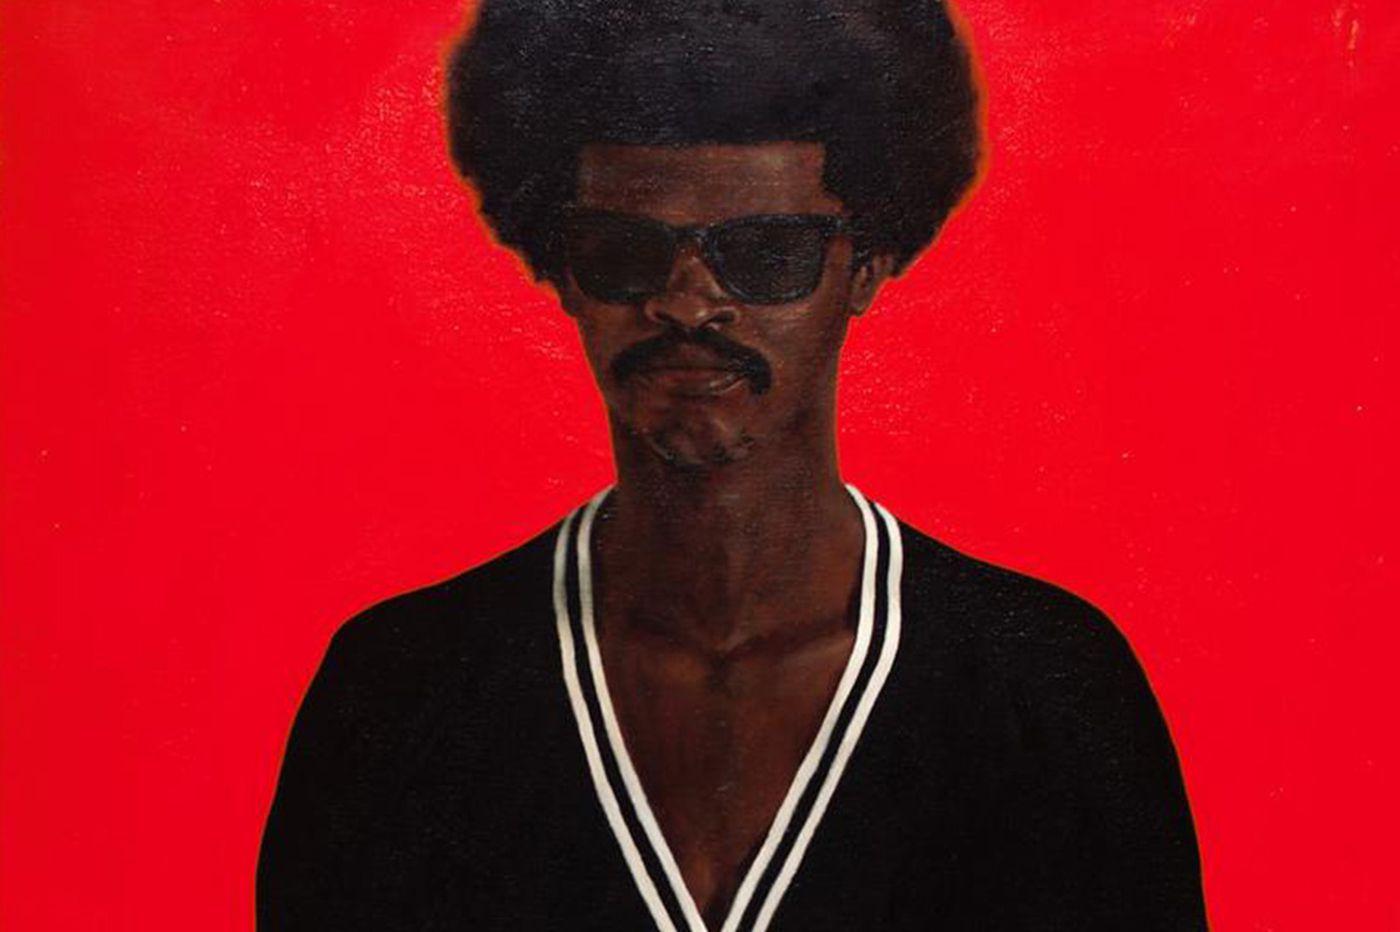 Art: Black Philadelphia artists, visible at last